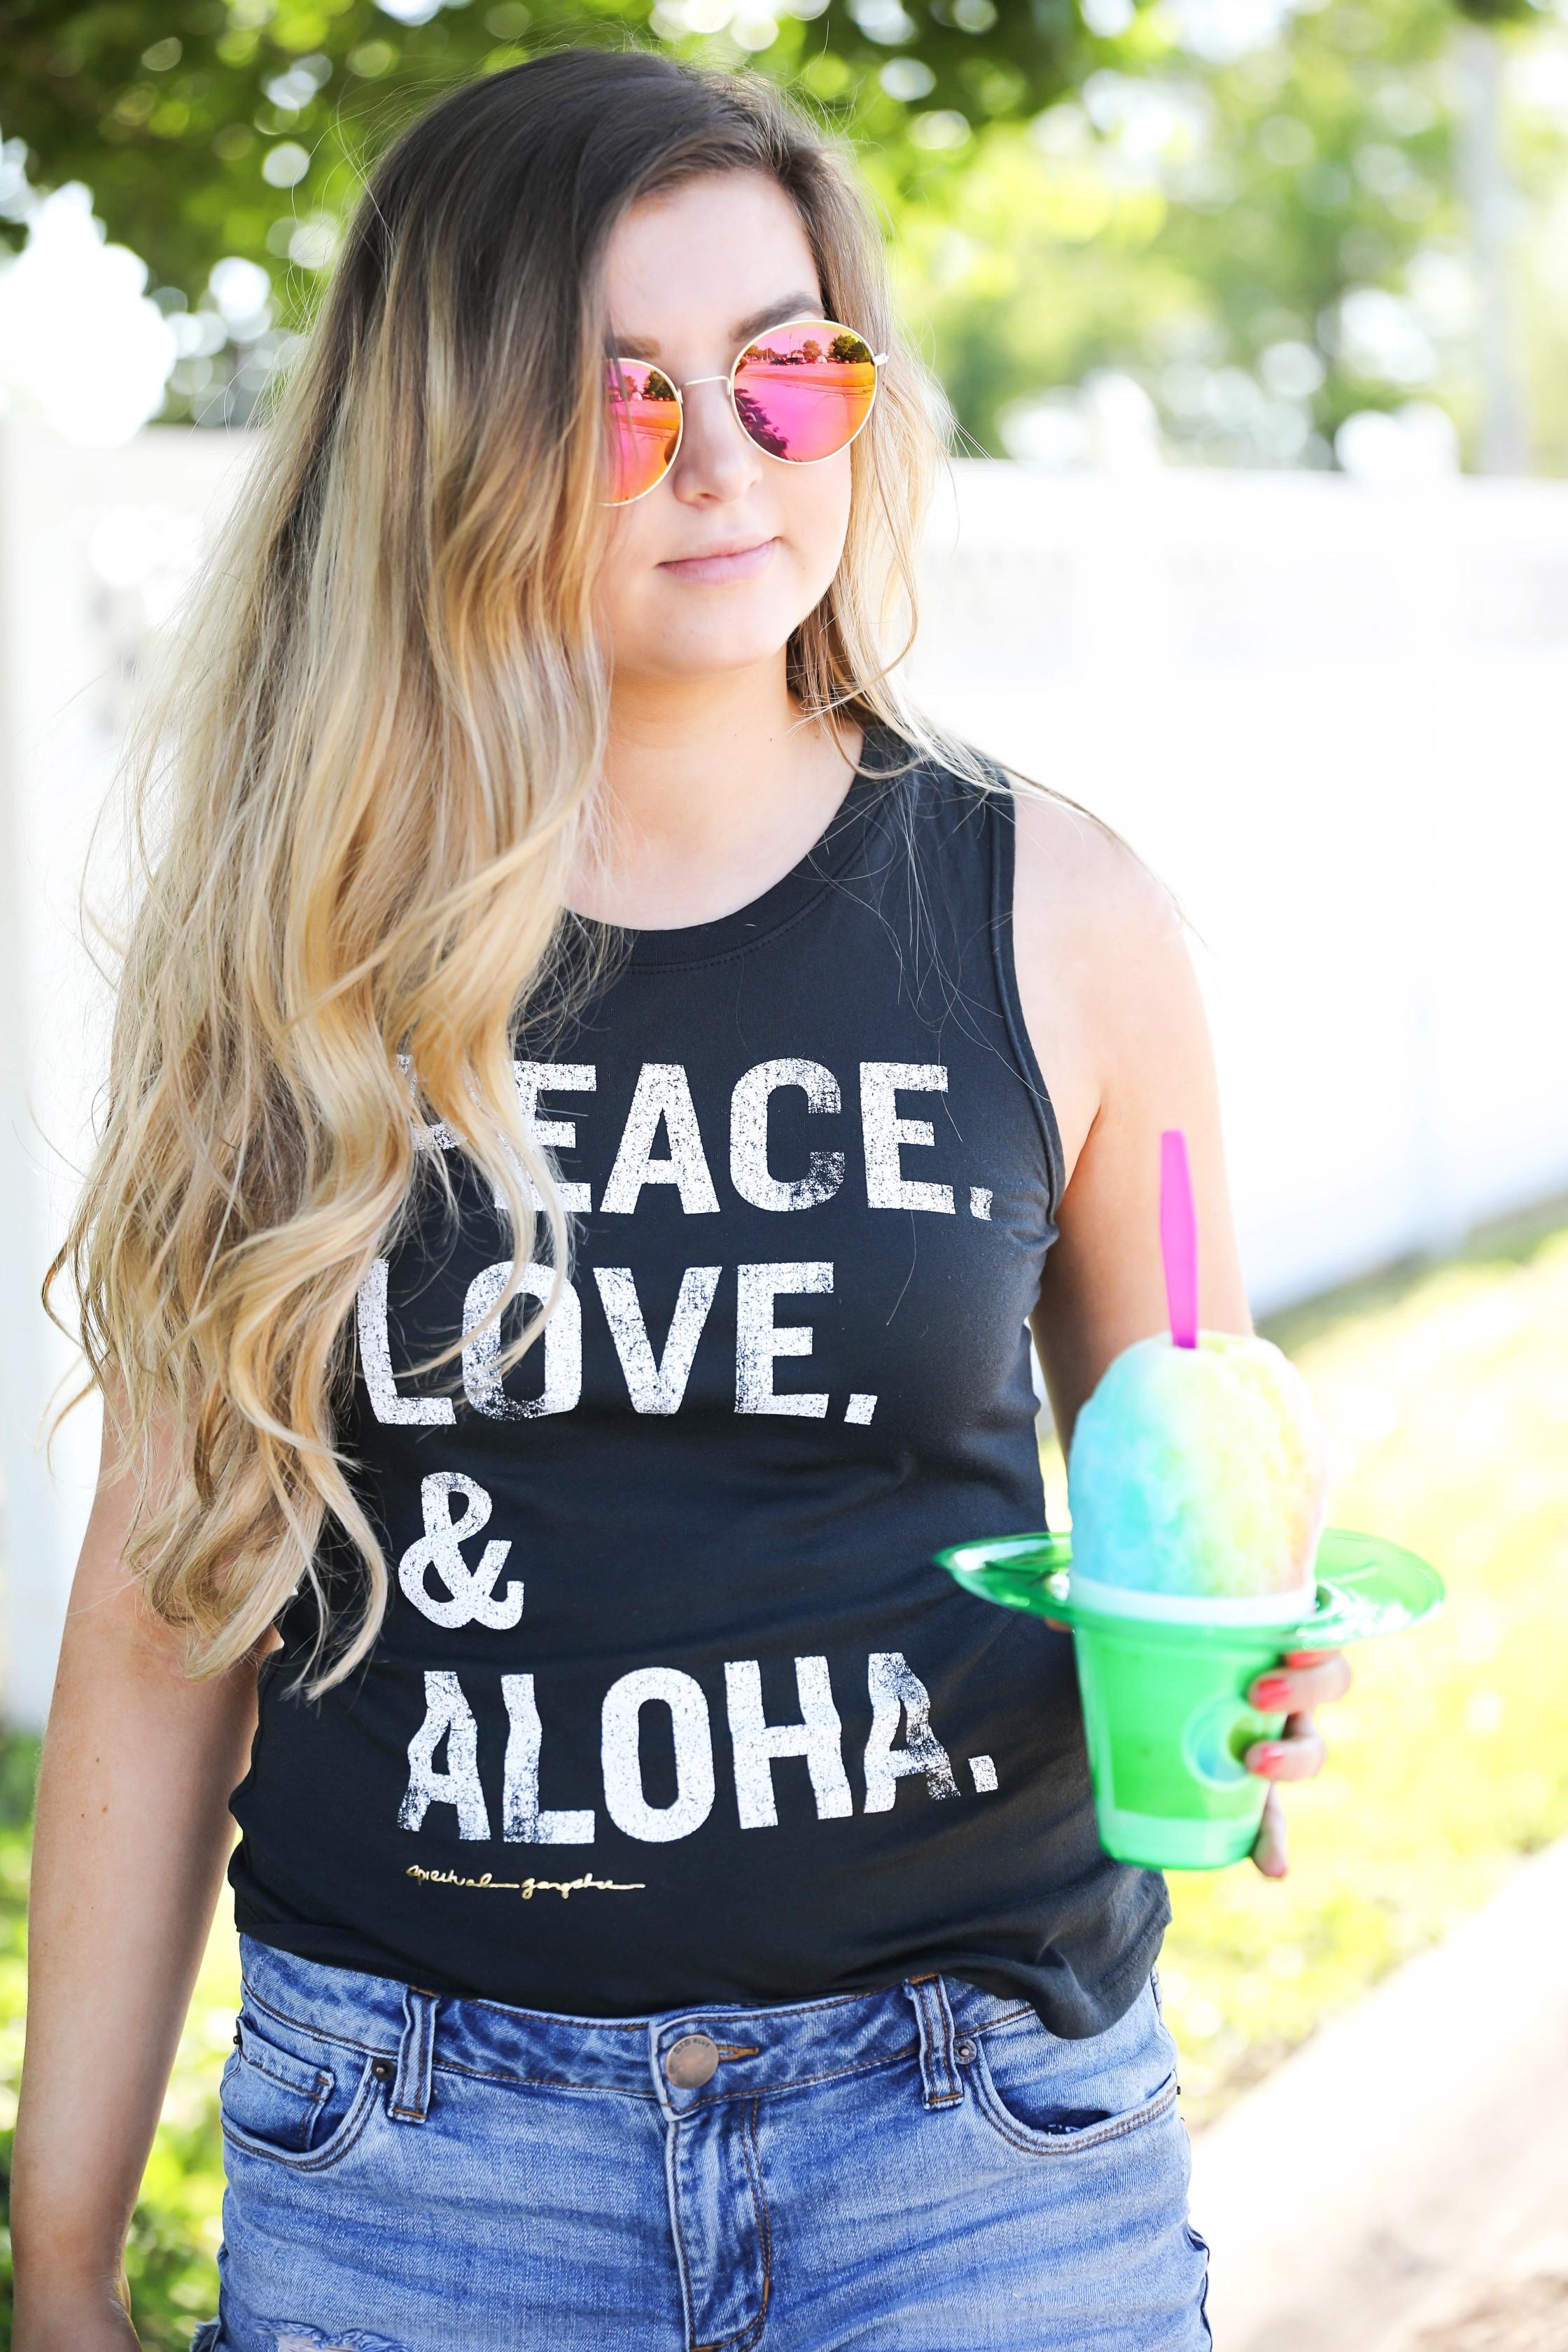 Aloha Summer Spiritual Gangster Top with snow cone by fashion blogger Lauren Lindmark on fashion blog daily dose of charm dailydoseofcharm.com